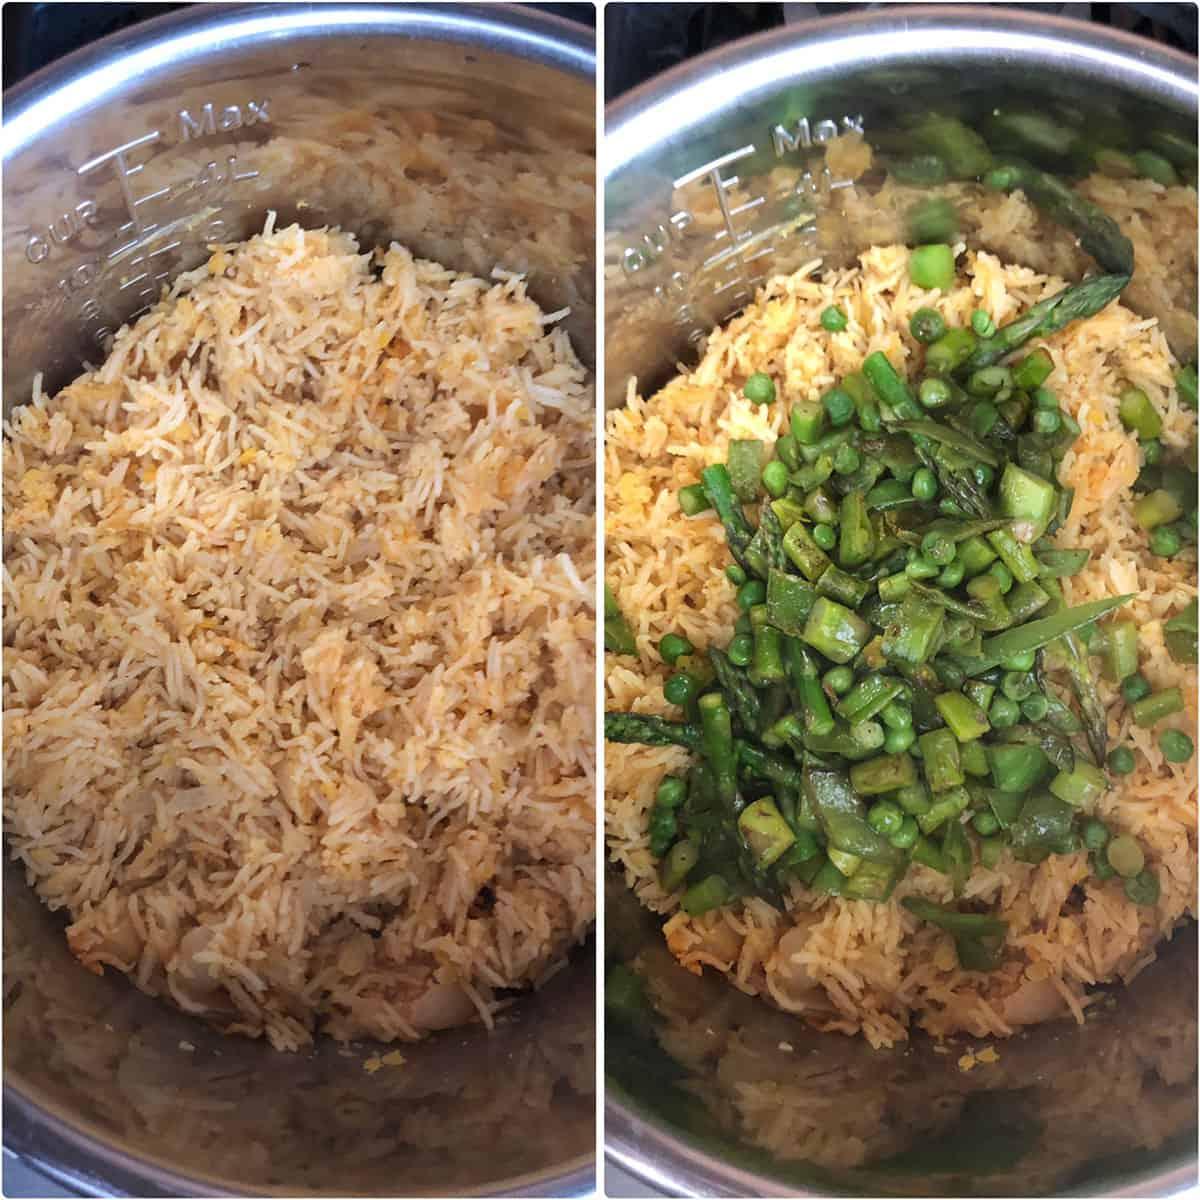 Cooked khichdi and adding the sautéed veggies